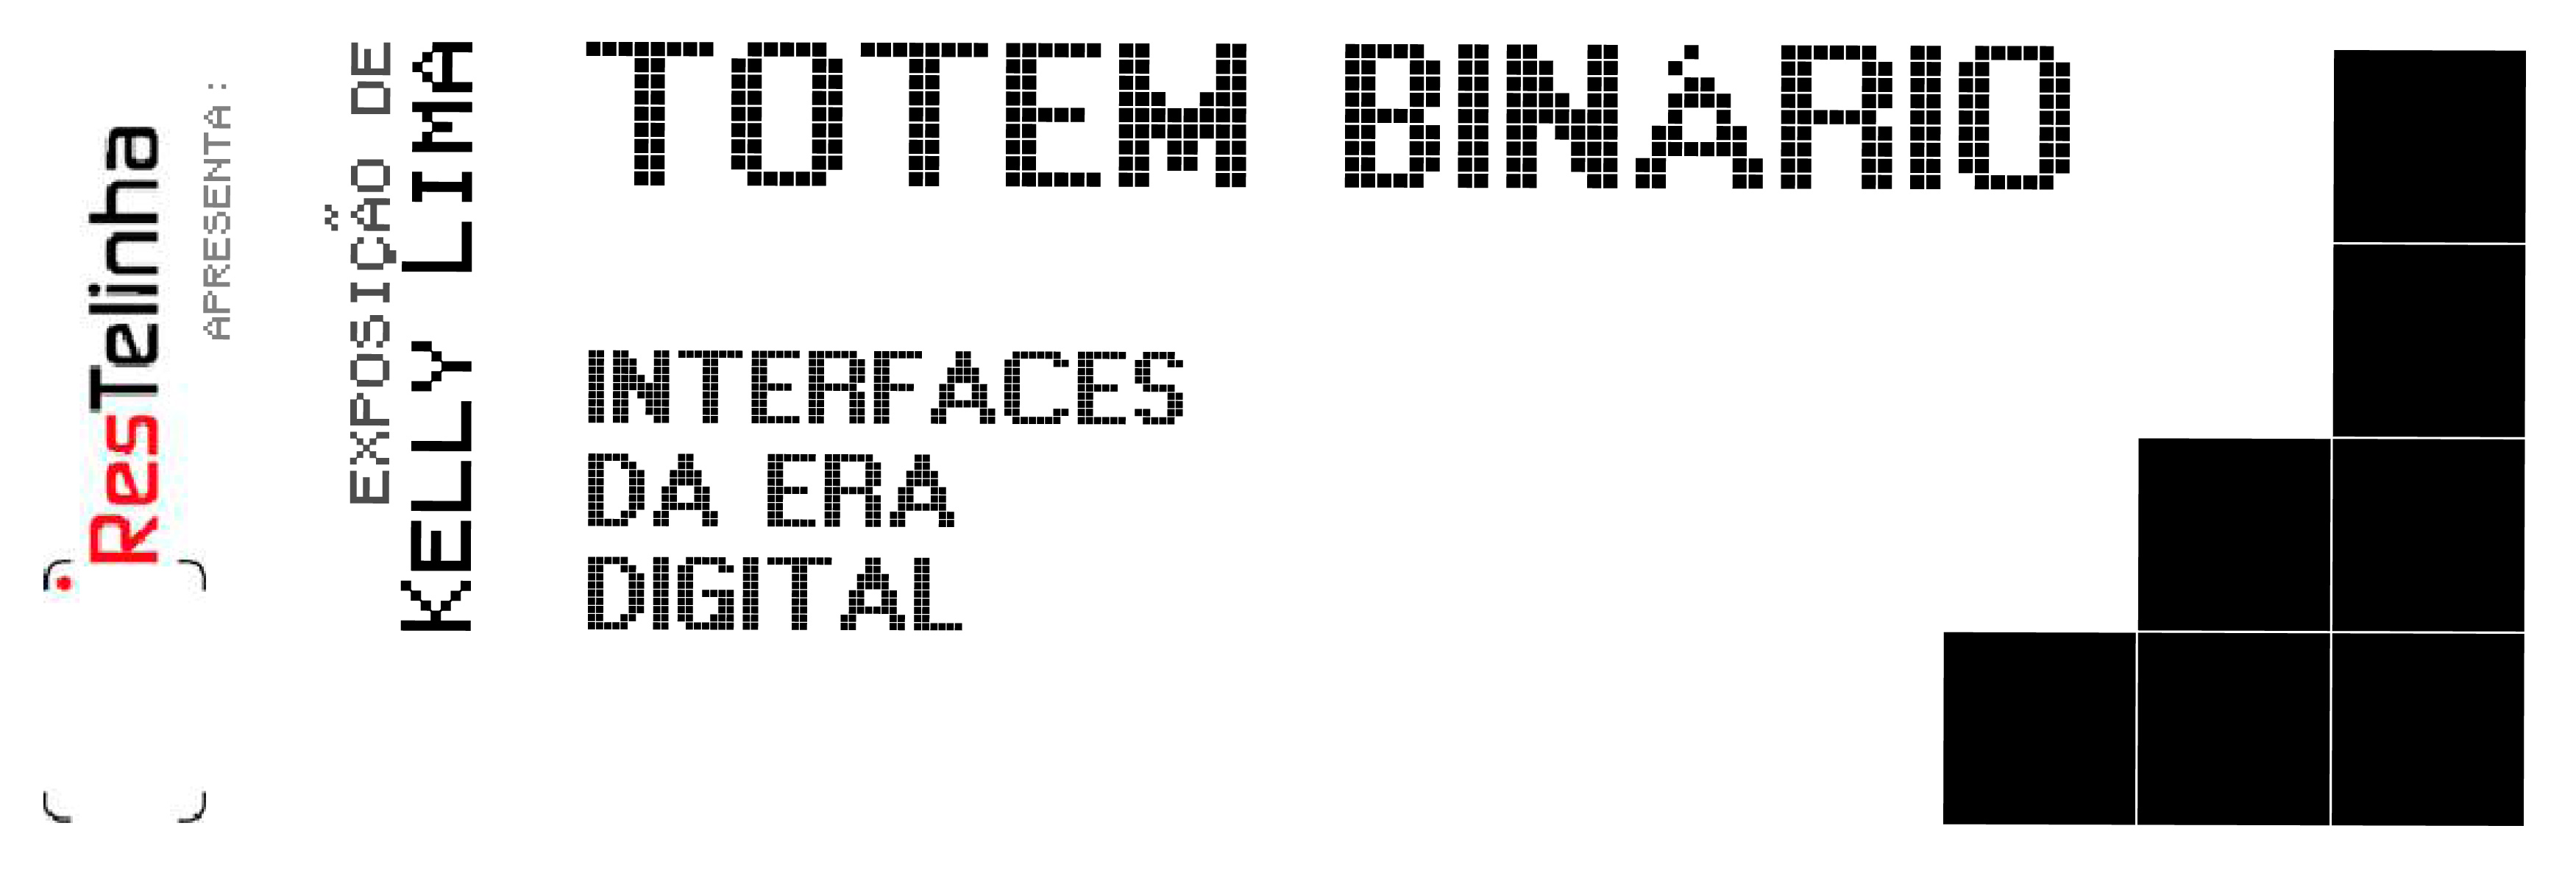 expoTotemBinarioFolder1